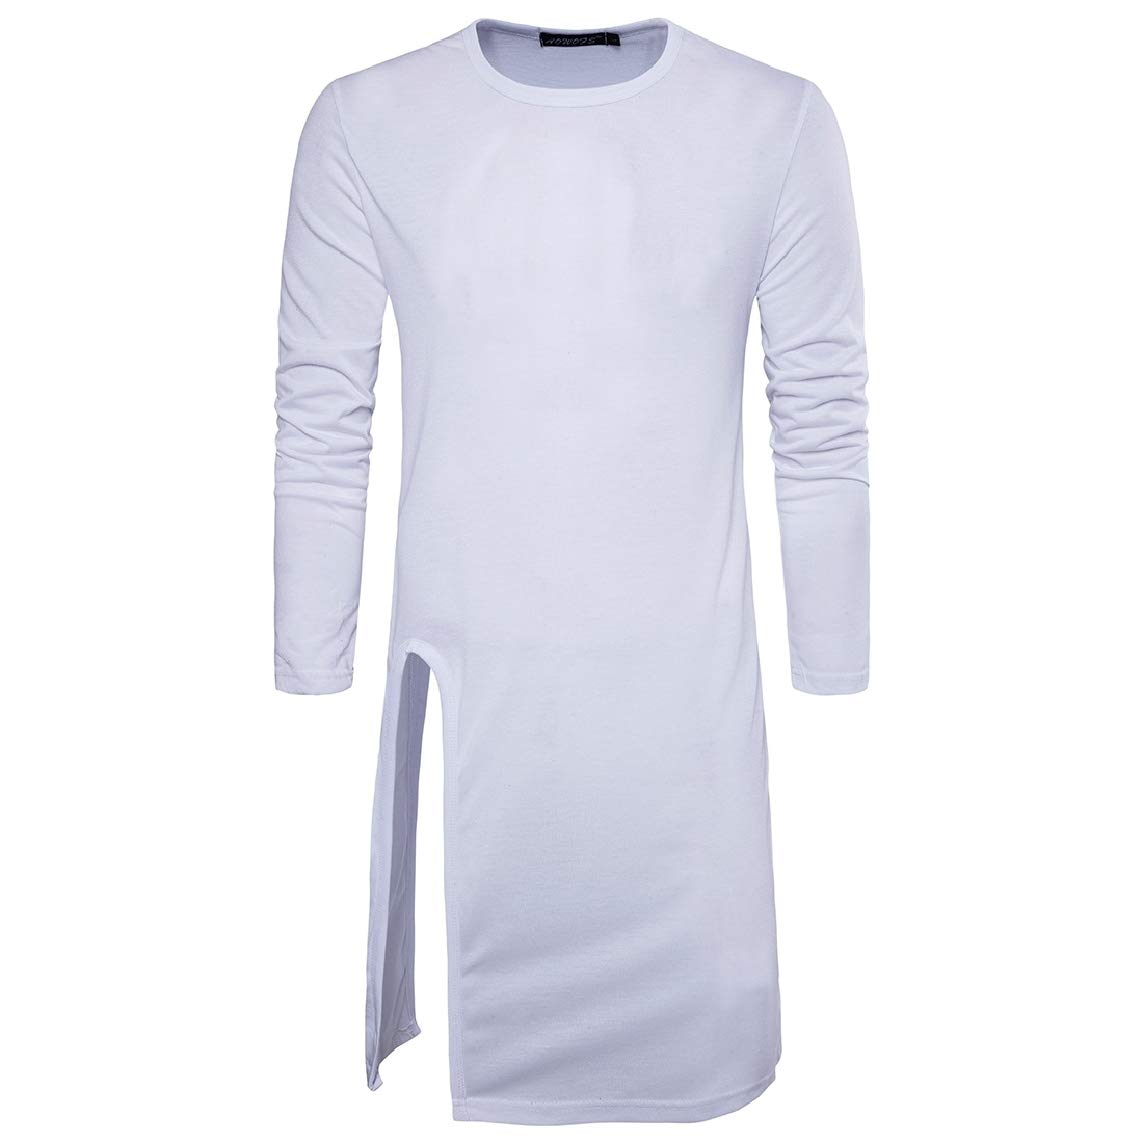 LinkShow Mens Pullover Long-Sleeve Hip Hop O-Neck Split Solid T-Shirt Top